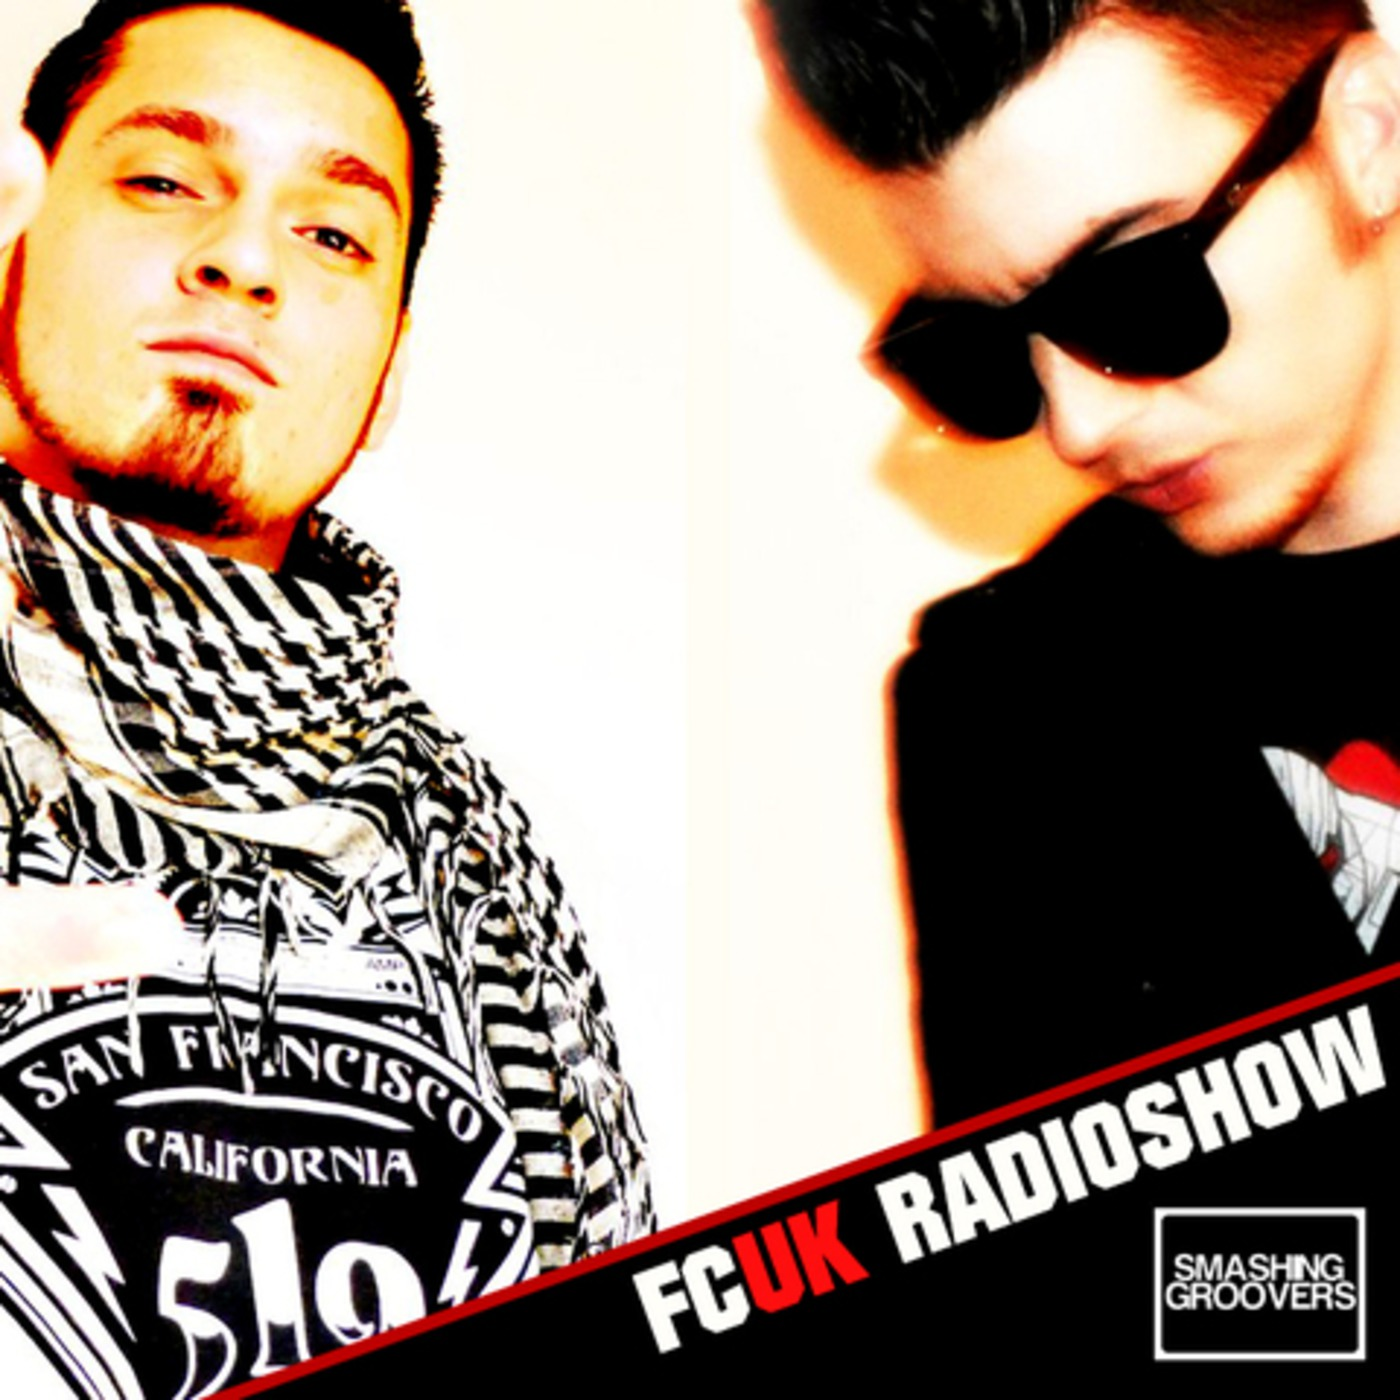 FCUK Radioshow